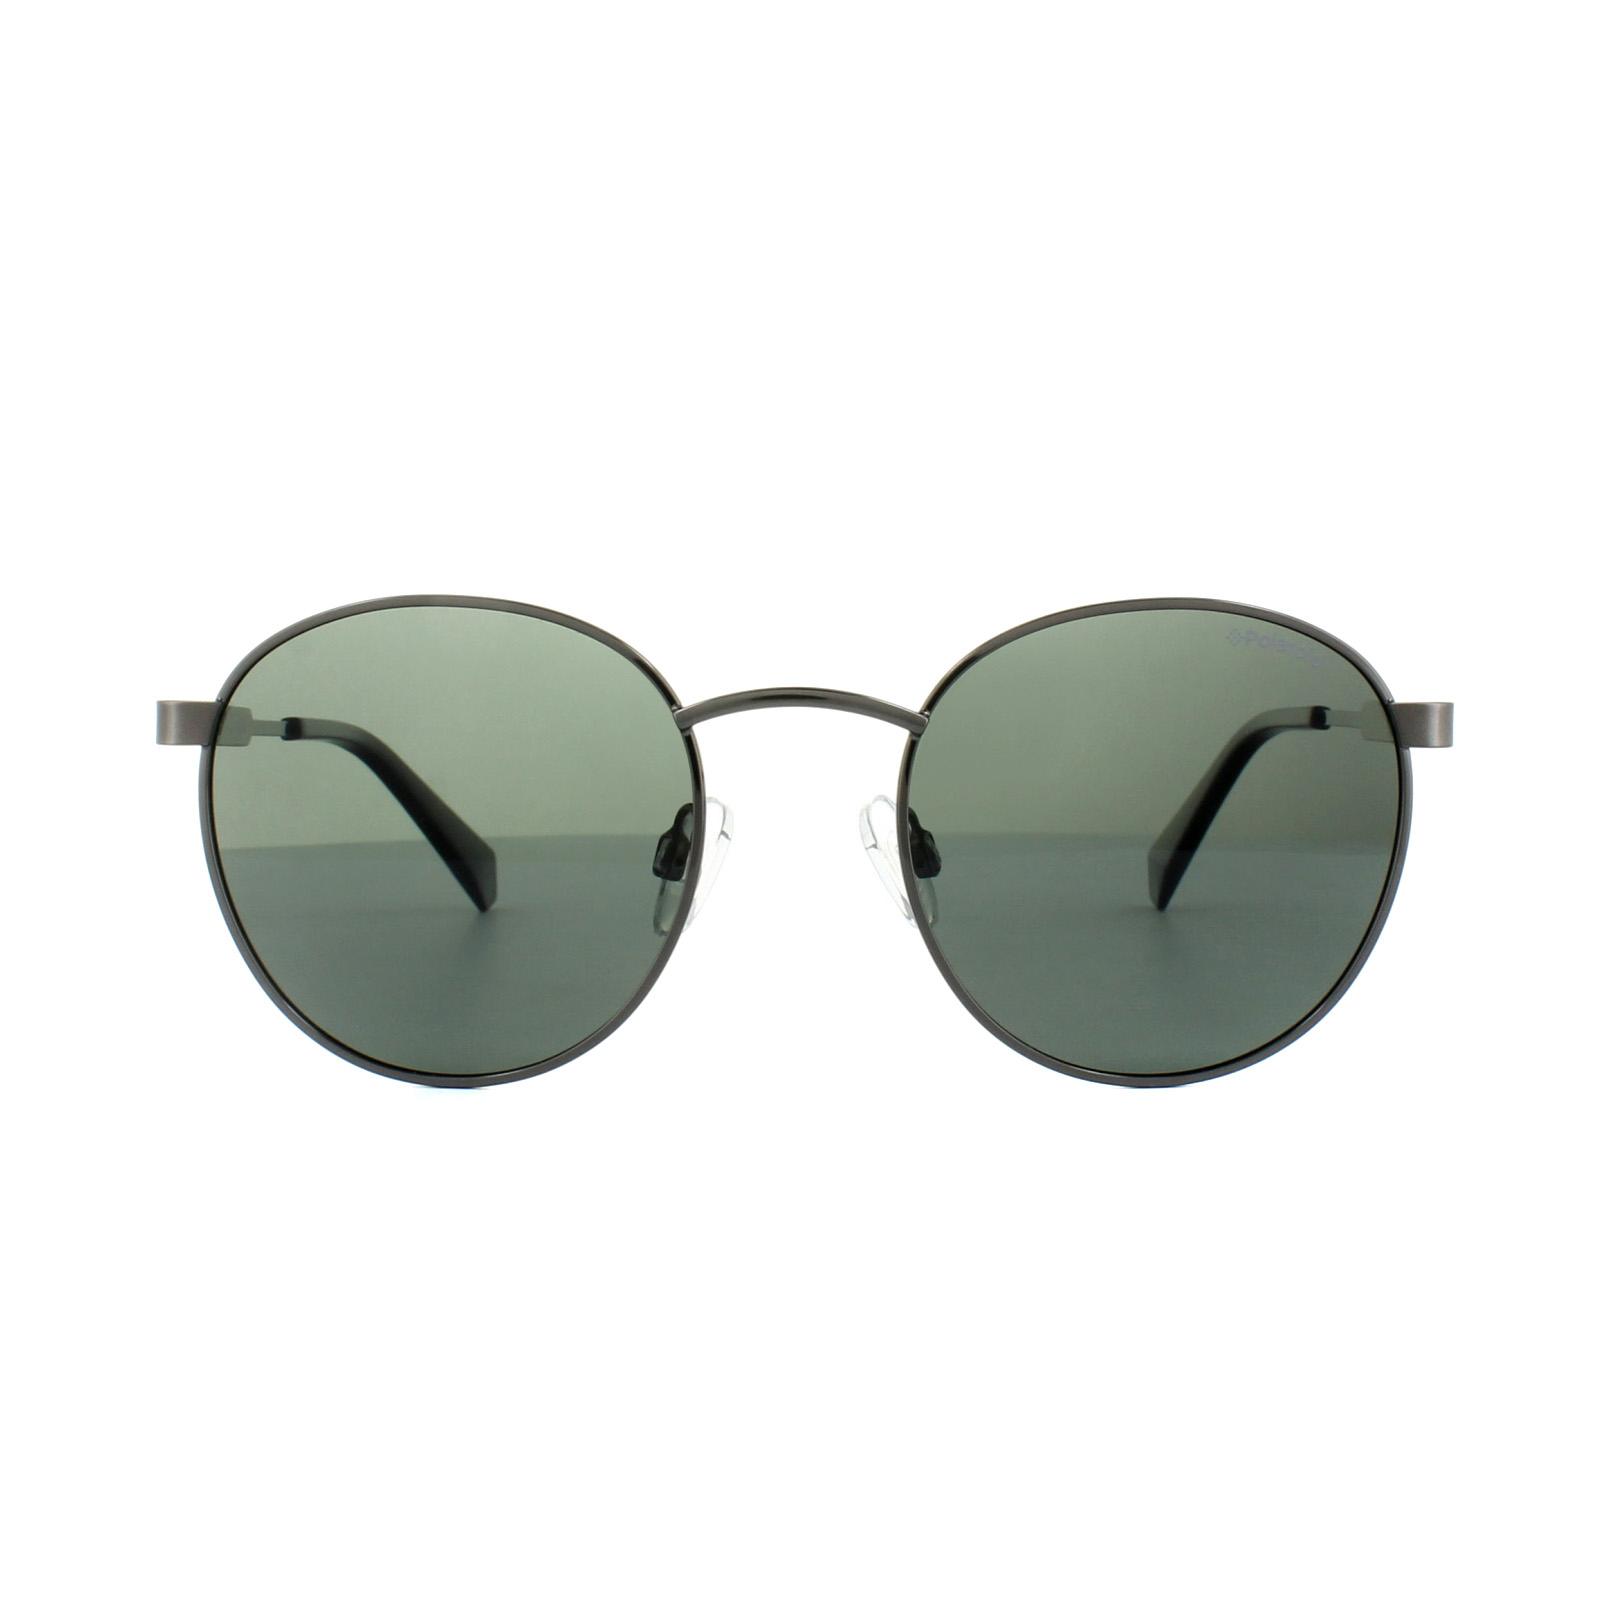 41d6f15728 Sentinel Polaroid Sunglasses PLD 2053 S KJ1 UC Dark Ruthenium Green  Polarized